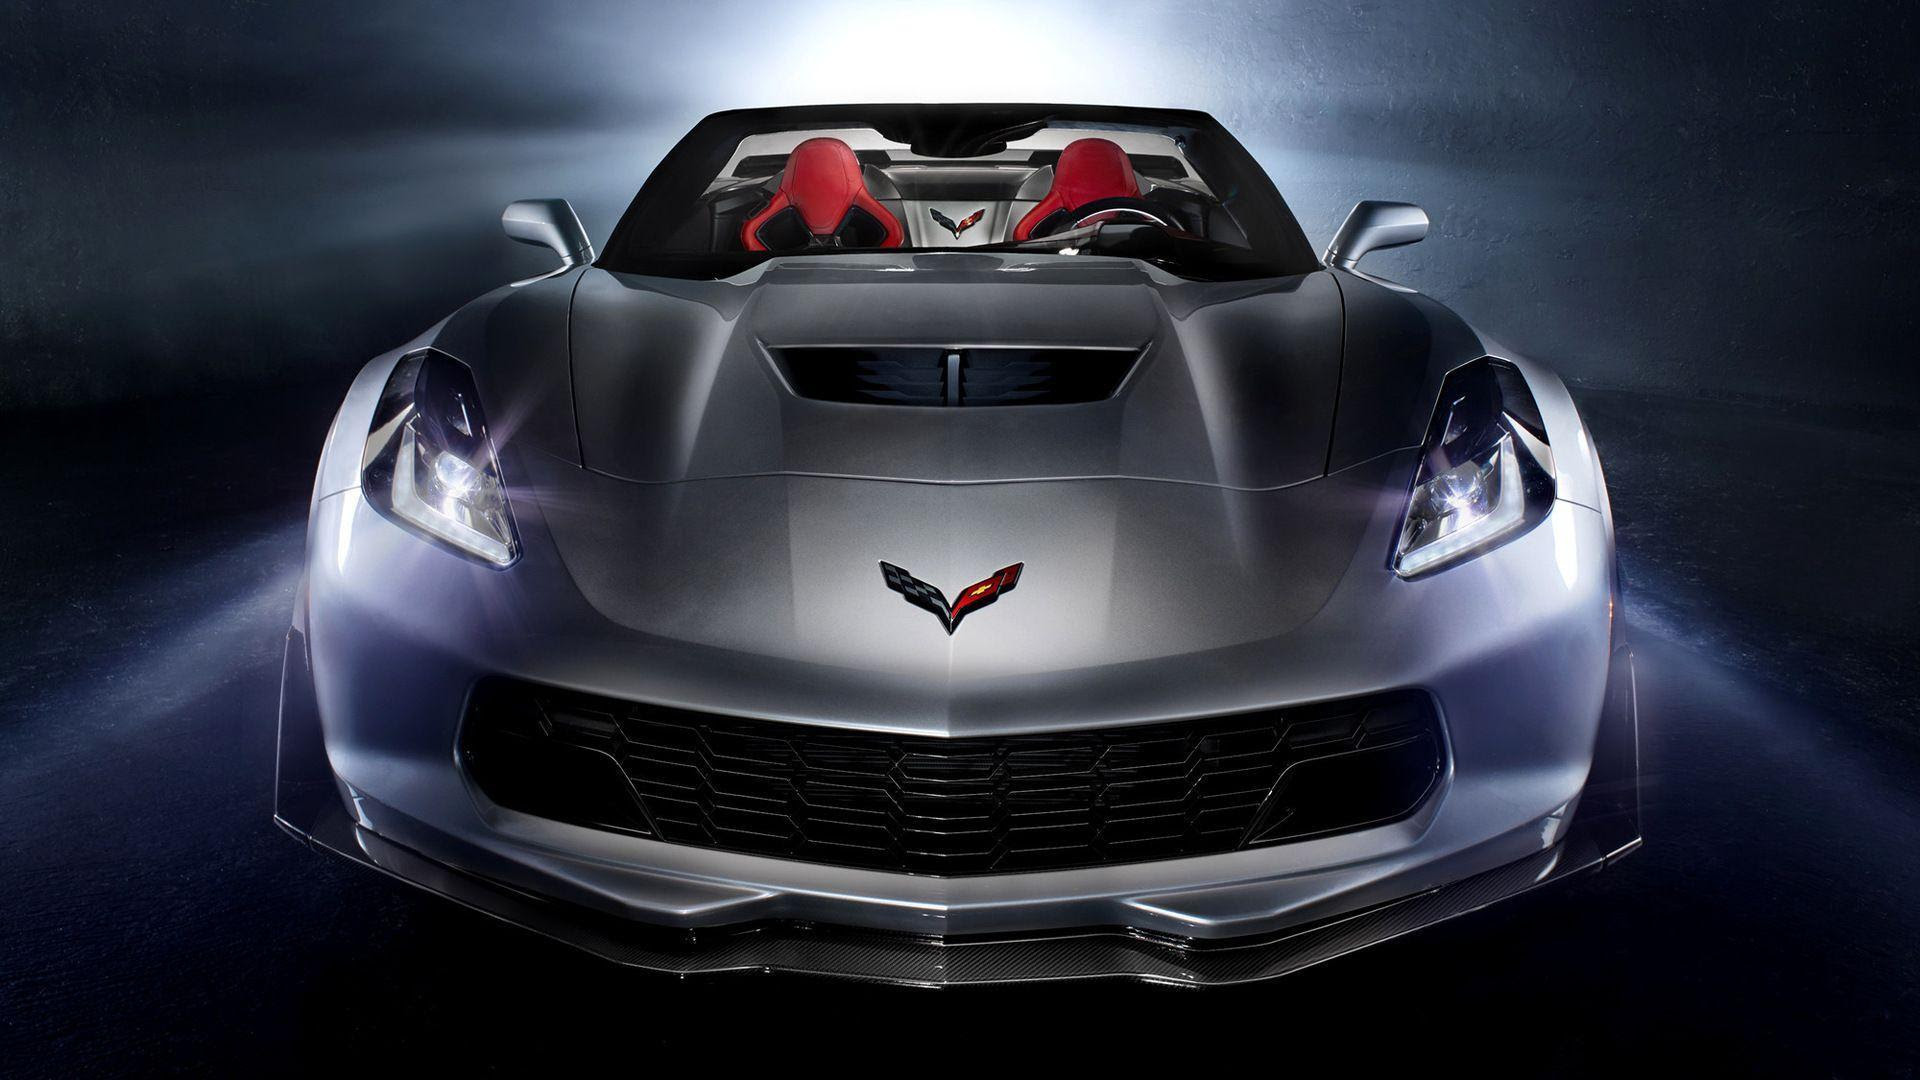 2016 Corvette Wallpapers  Wallpaper Cave